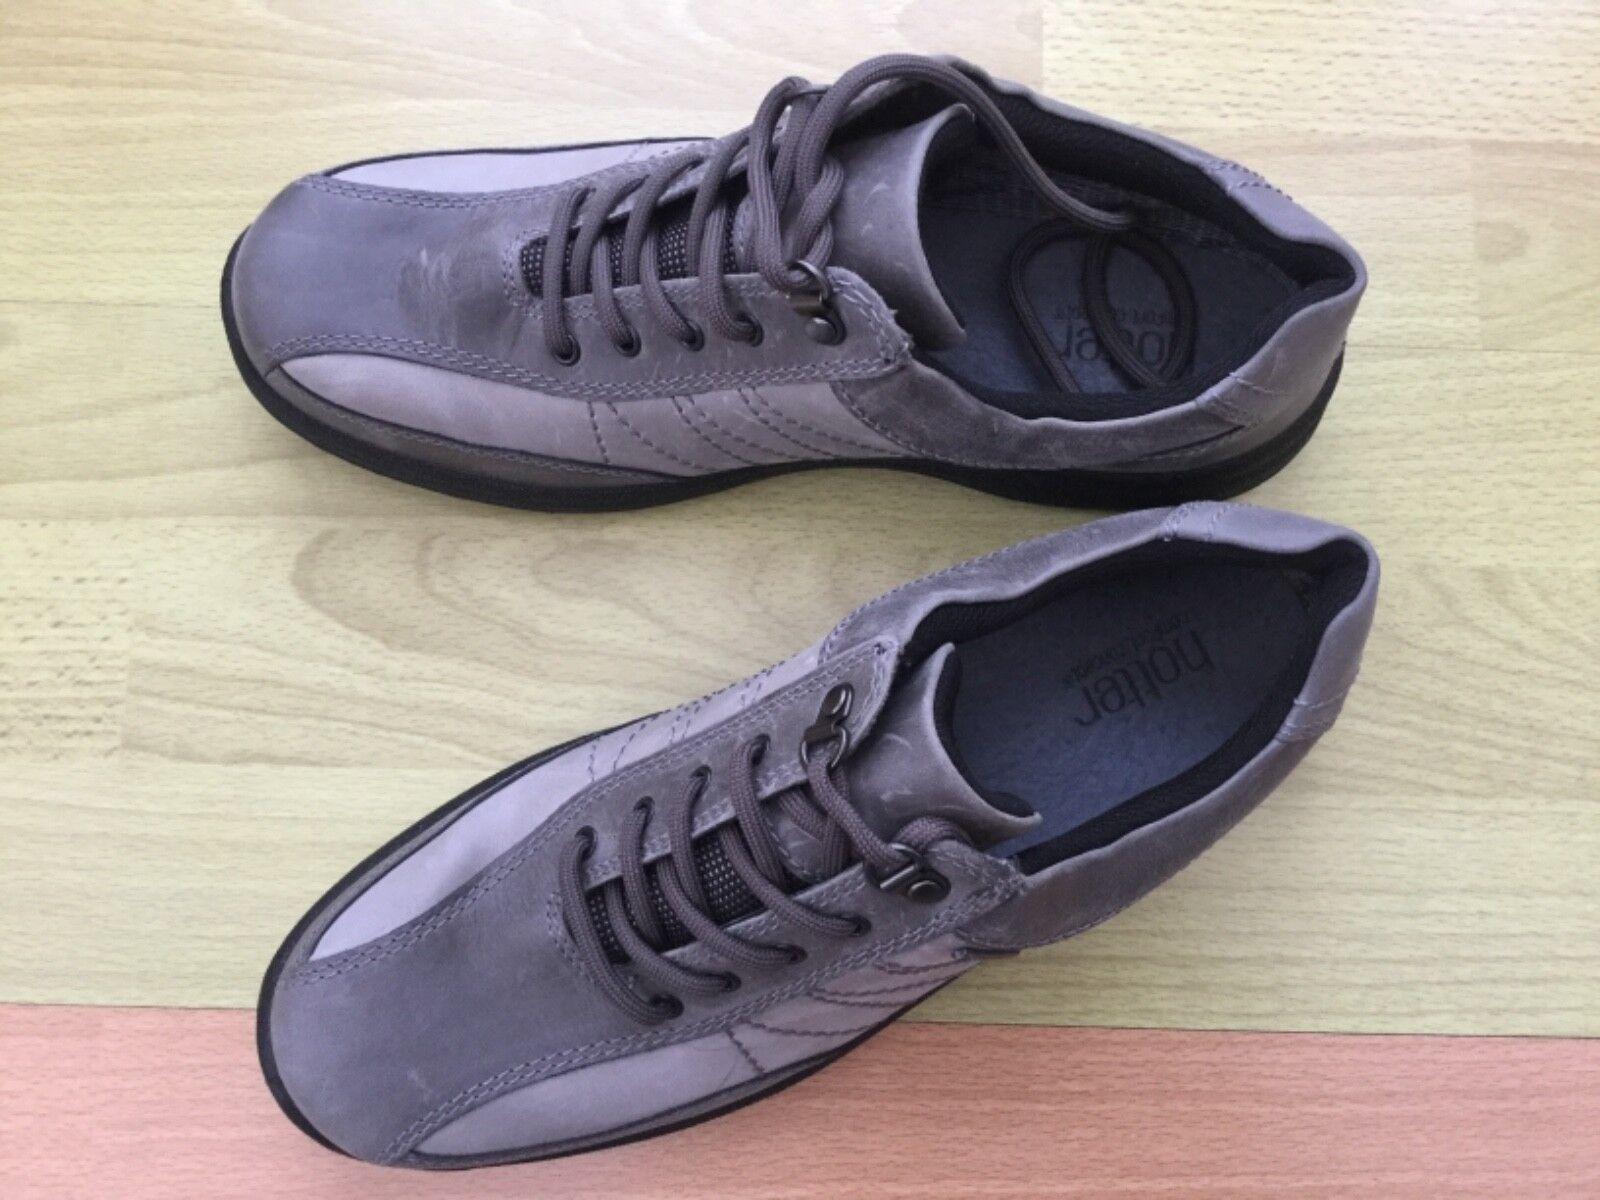 Nuevos Zapatos para mujer más caliente Impermeable Transpirable UK Gore-Tex UK Transpirable Size 8 humo/caliza b52539